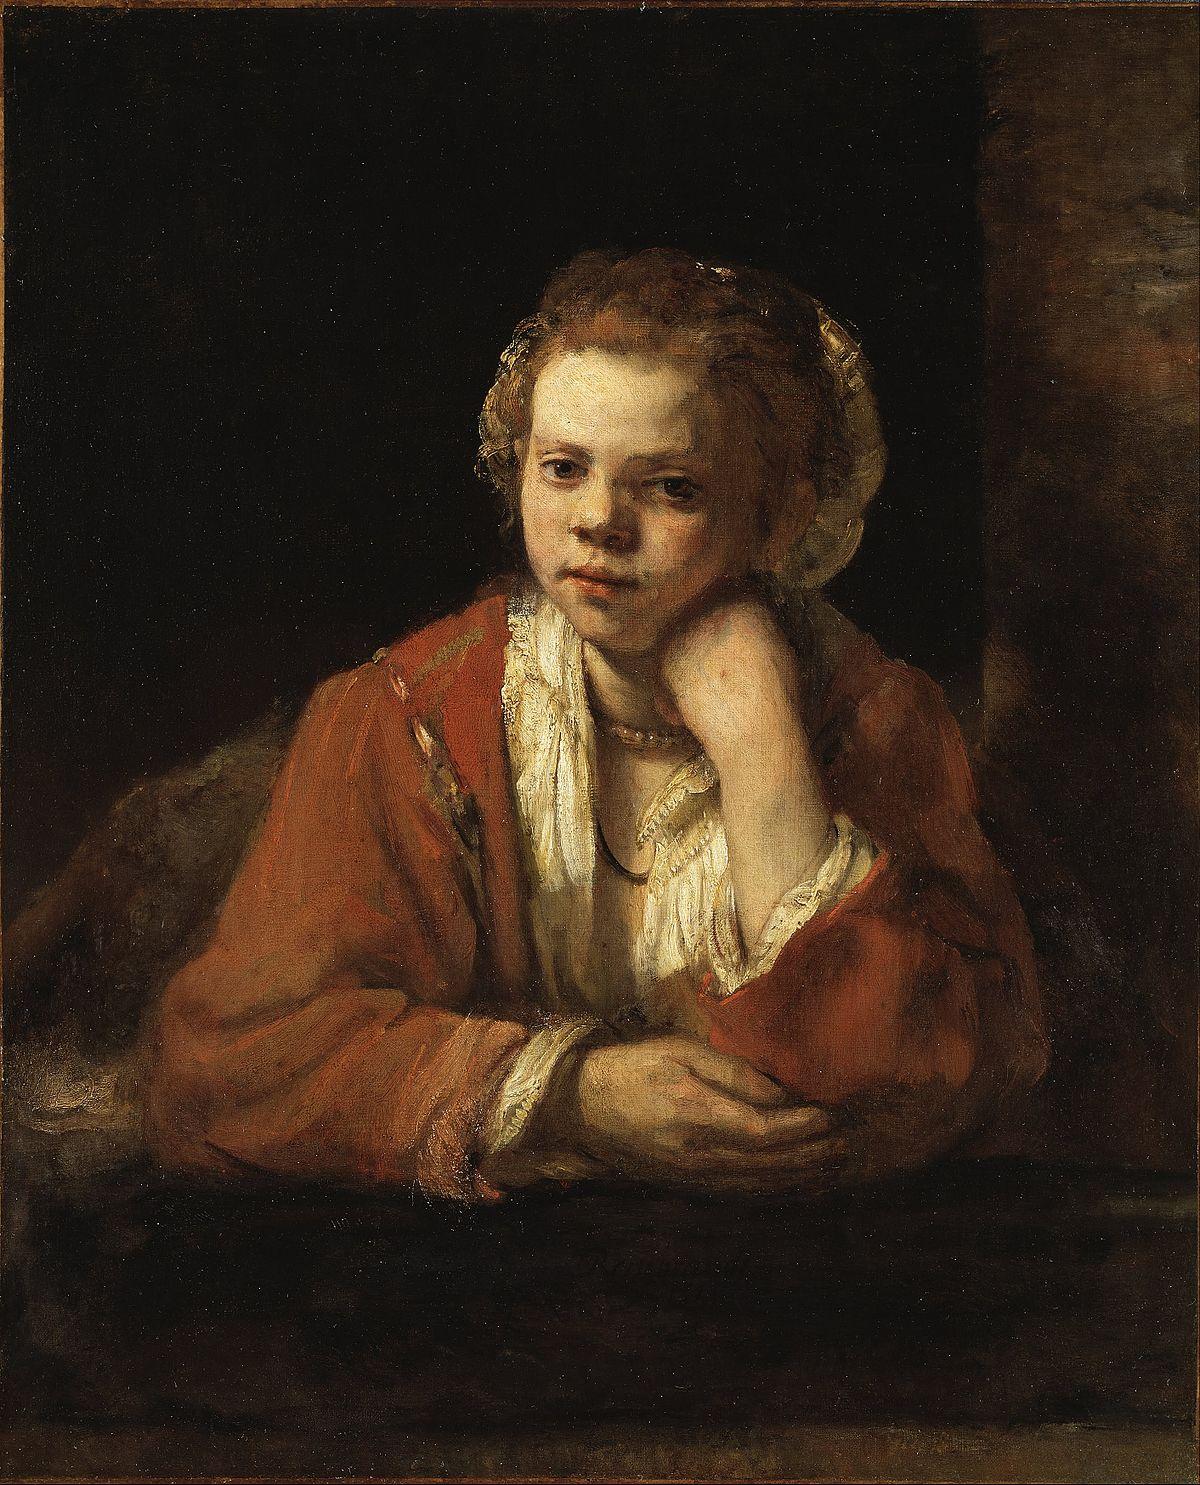 The Kitchen Maid (Rembrandt) - Wikipedia